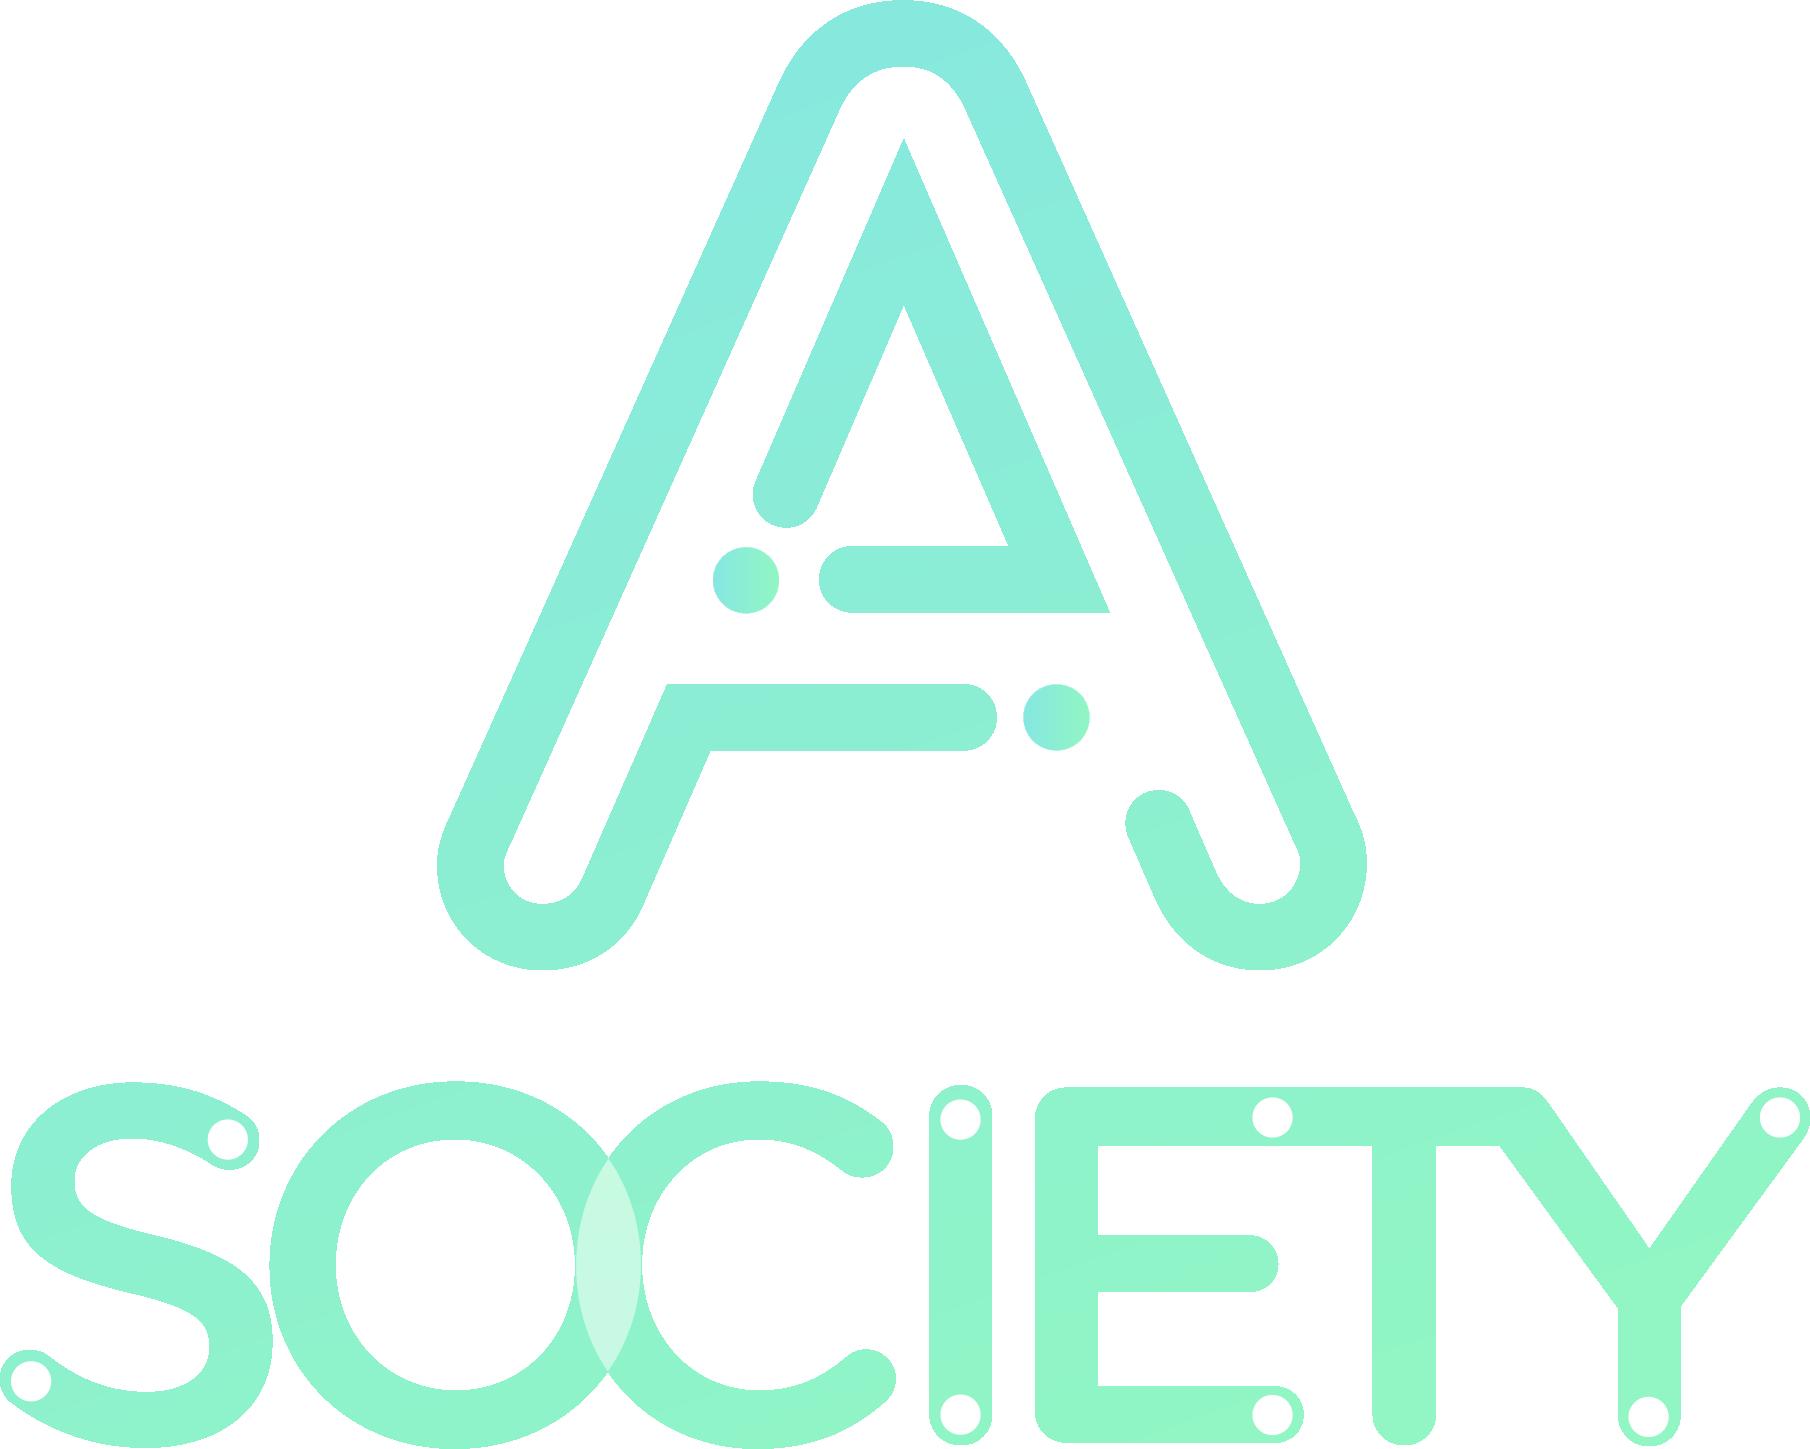 A_Society_green_whitedots.png